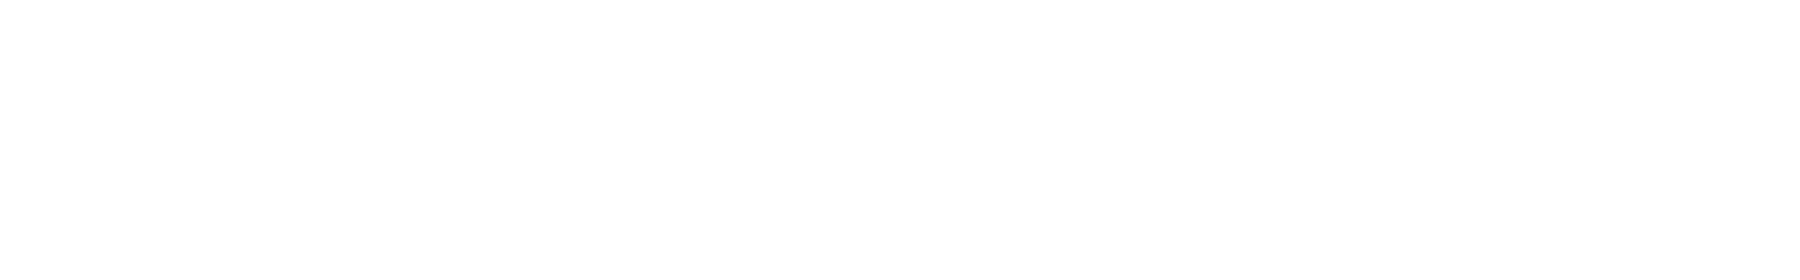 vocal fx   naming electro house genre 125 bpm